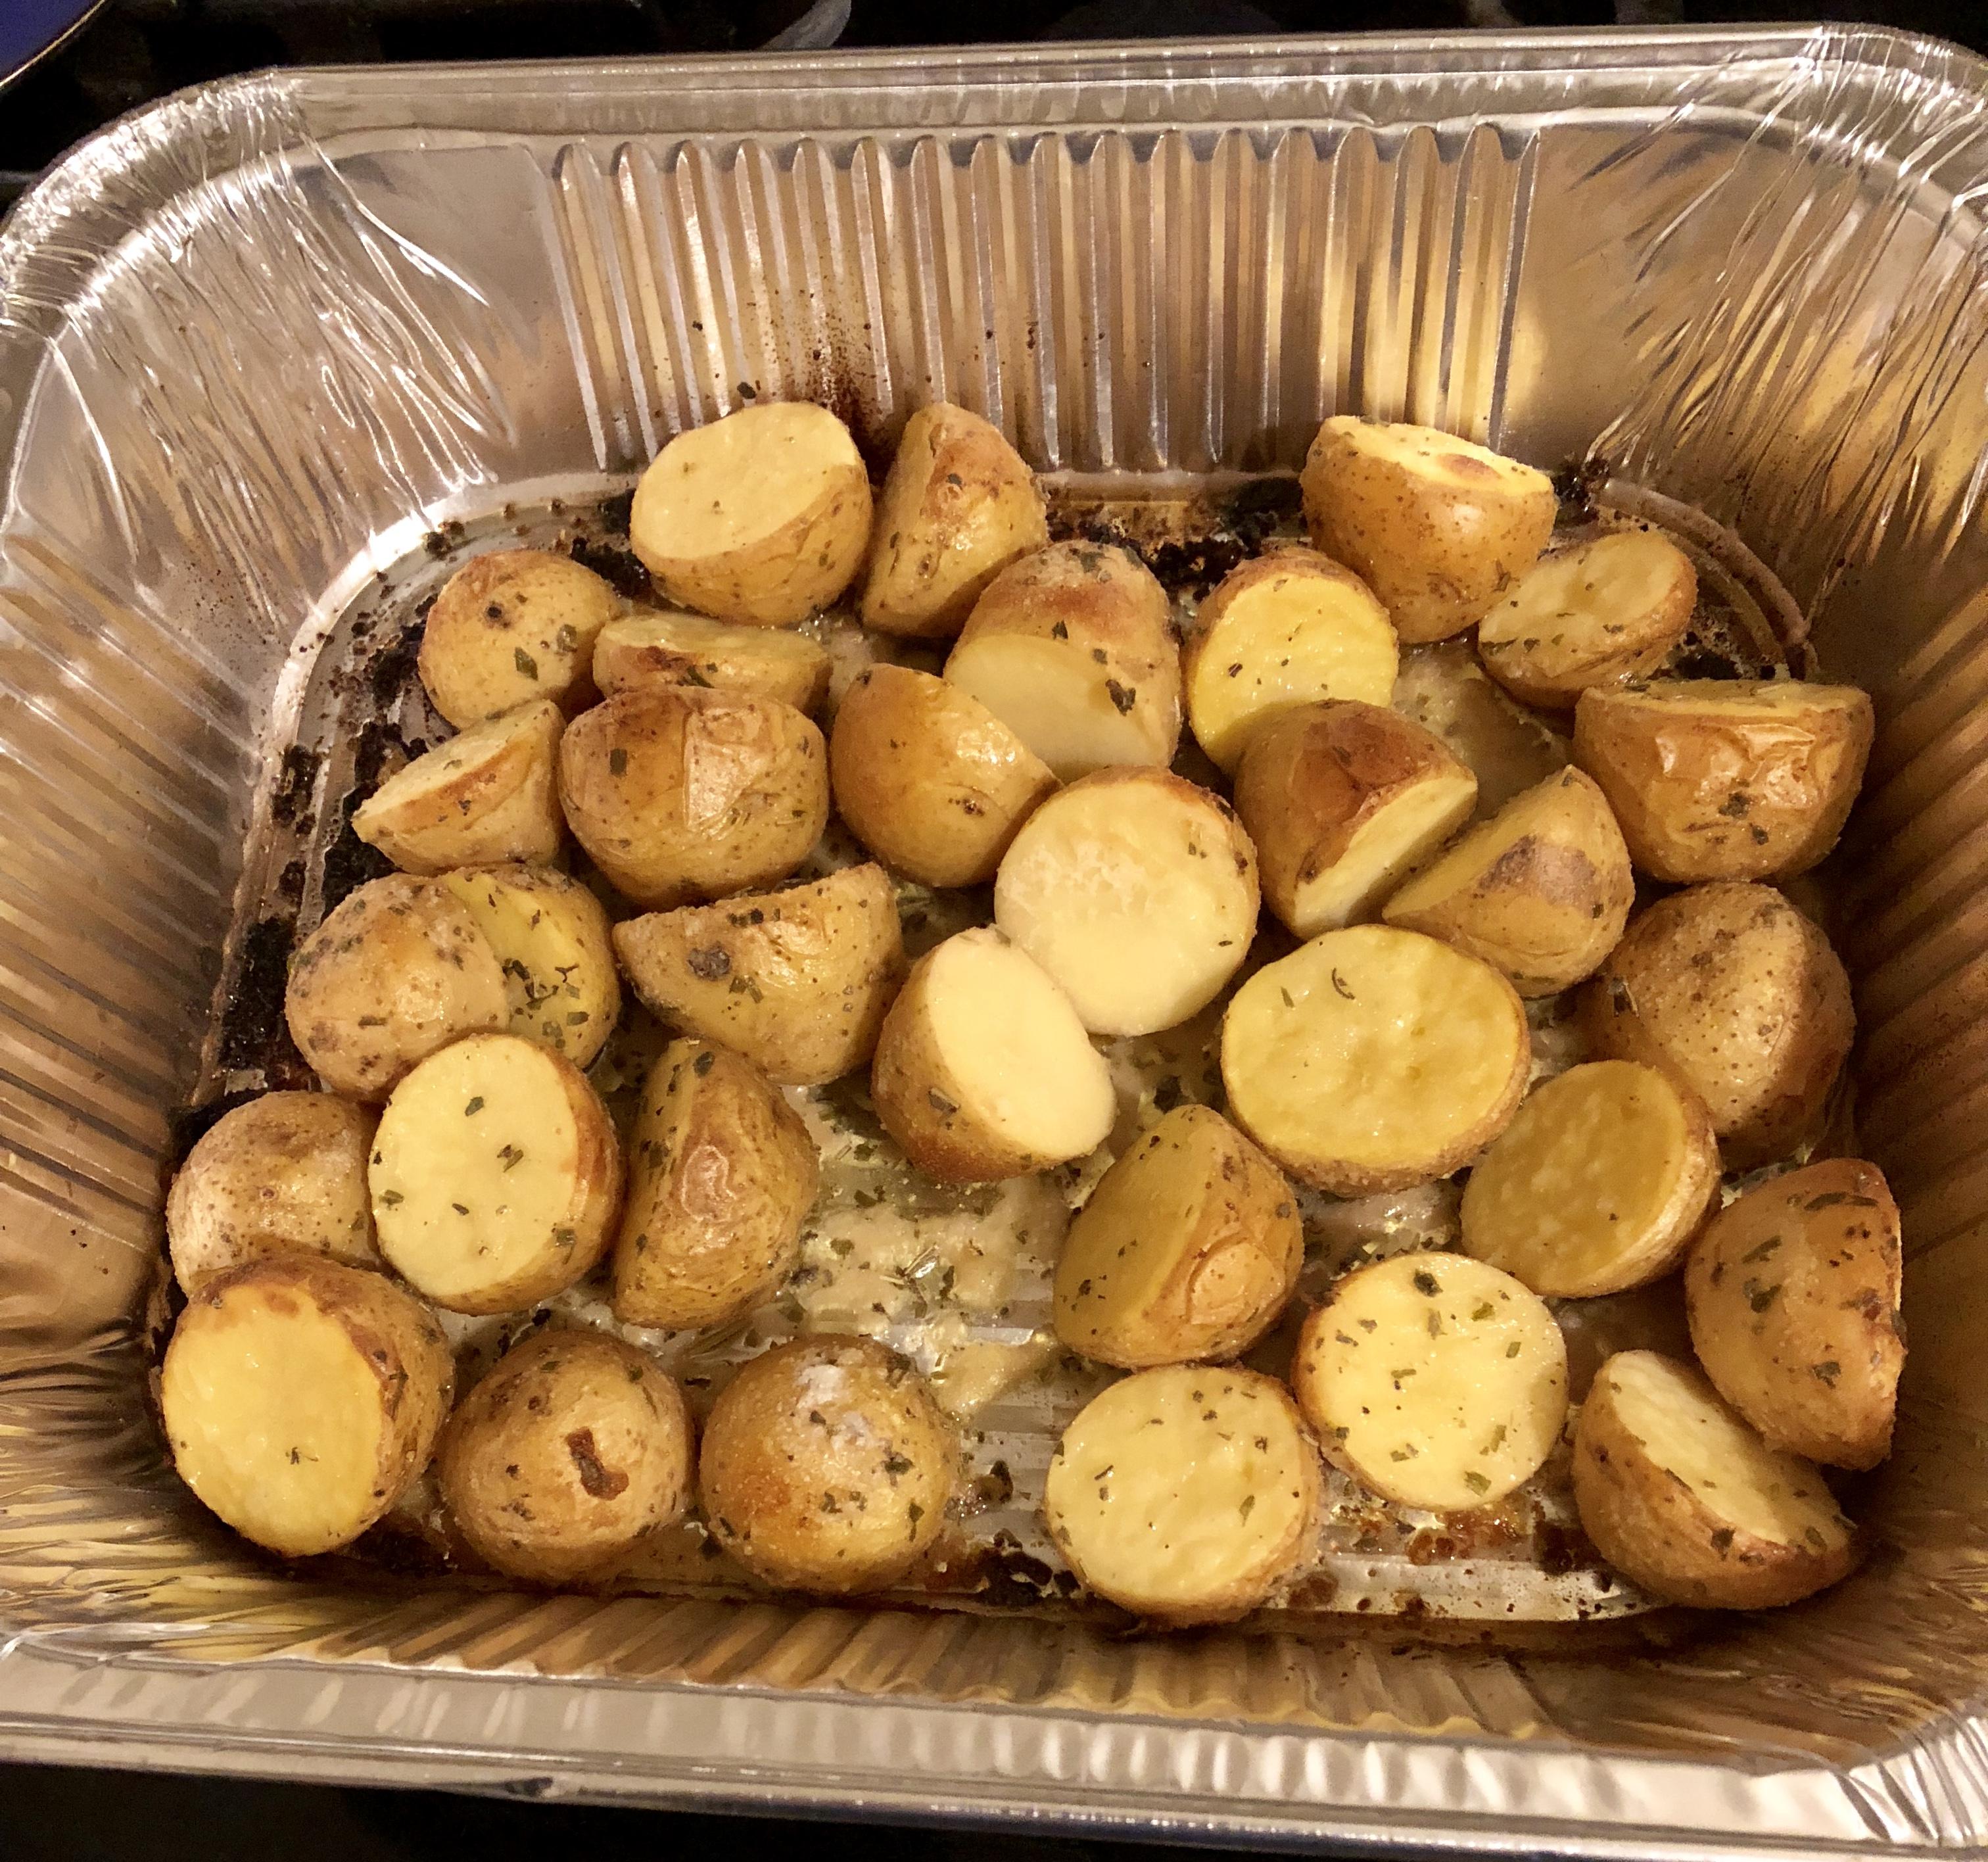 Garlic and Vinegar Roasted Potatoes ToffeeSmiles22